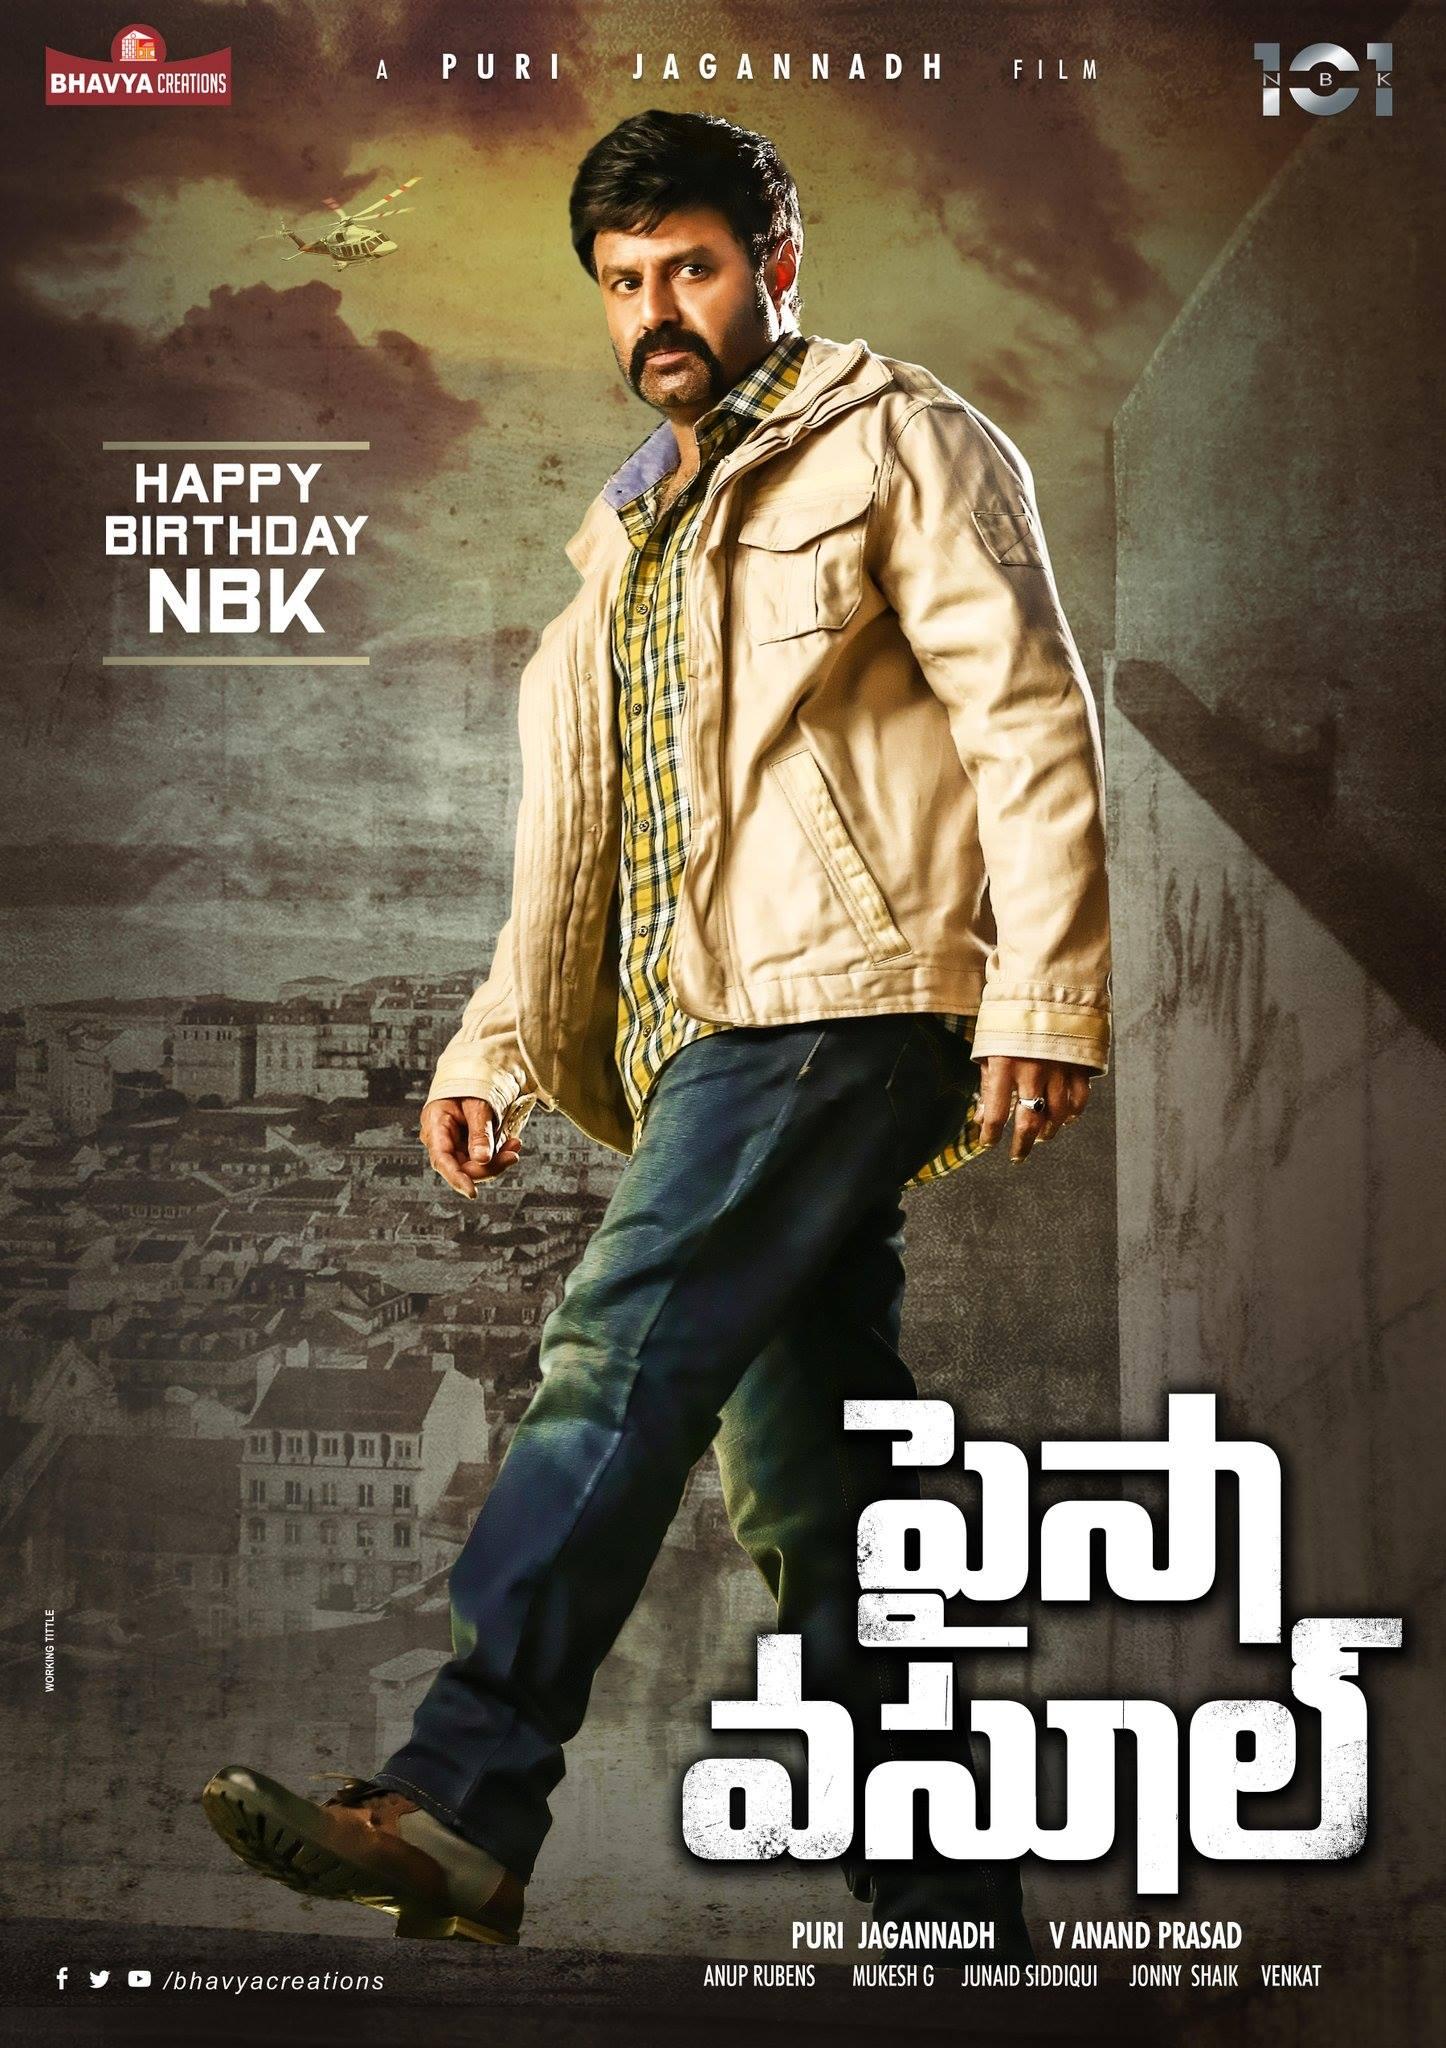 Nandamuri balakrishna paisa vasool movie first look ultra - Movie poster wallpaper ...